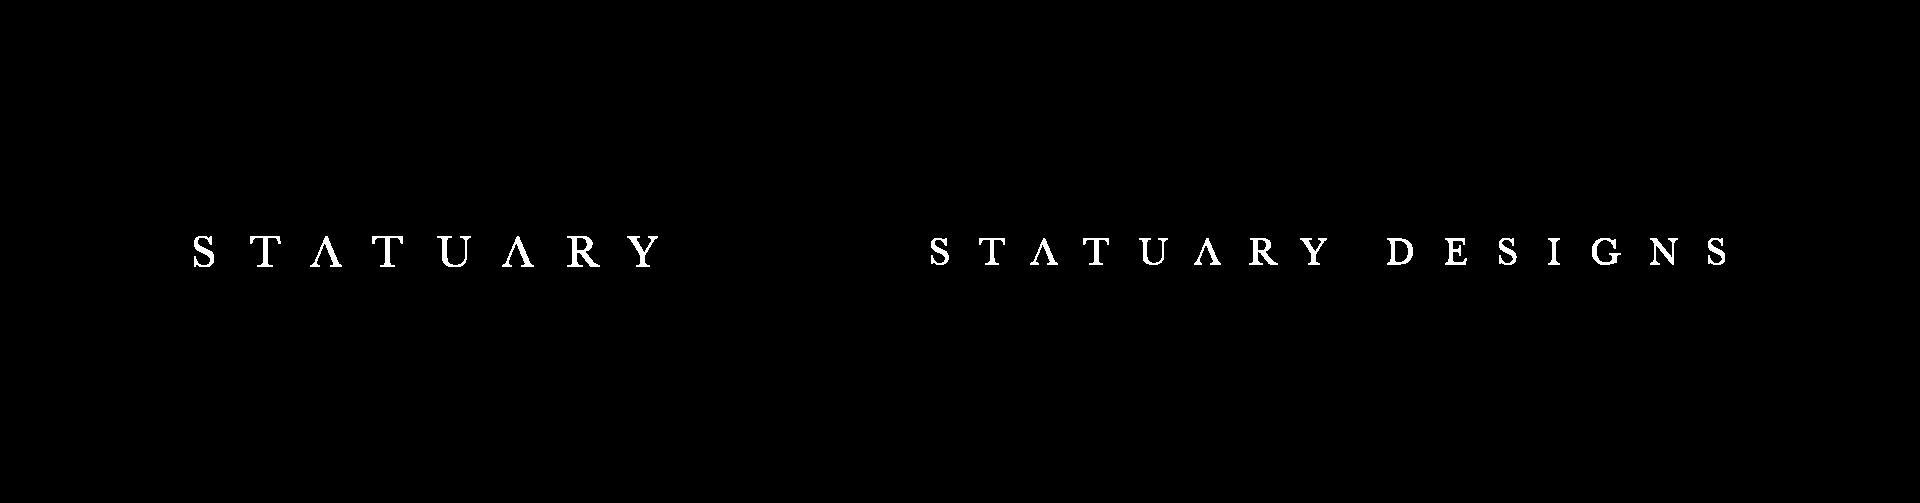 statuary-primarylogotypes-1